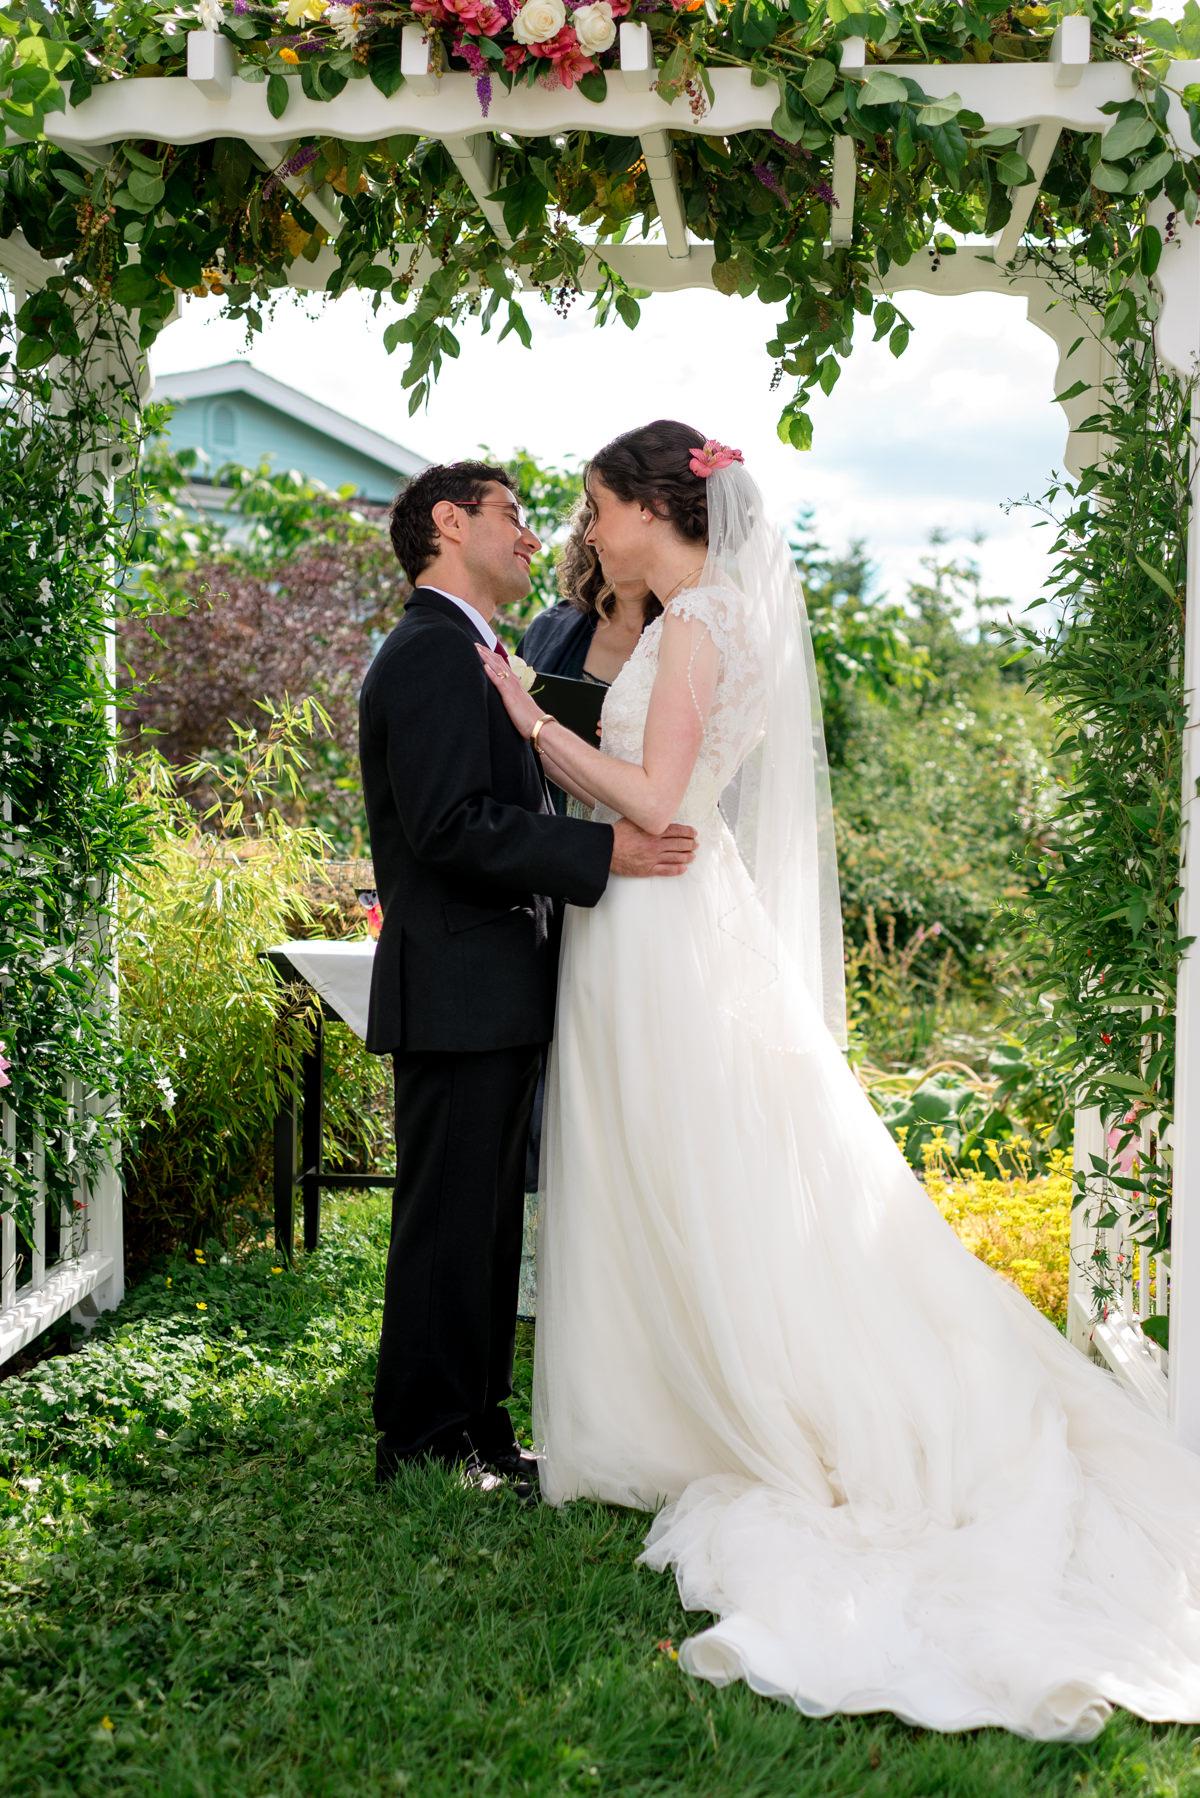 Andrew Tat - Documentary Wedding Photography - Kirkland, Washington - Emily & Cuauh - 15.JPG